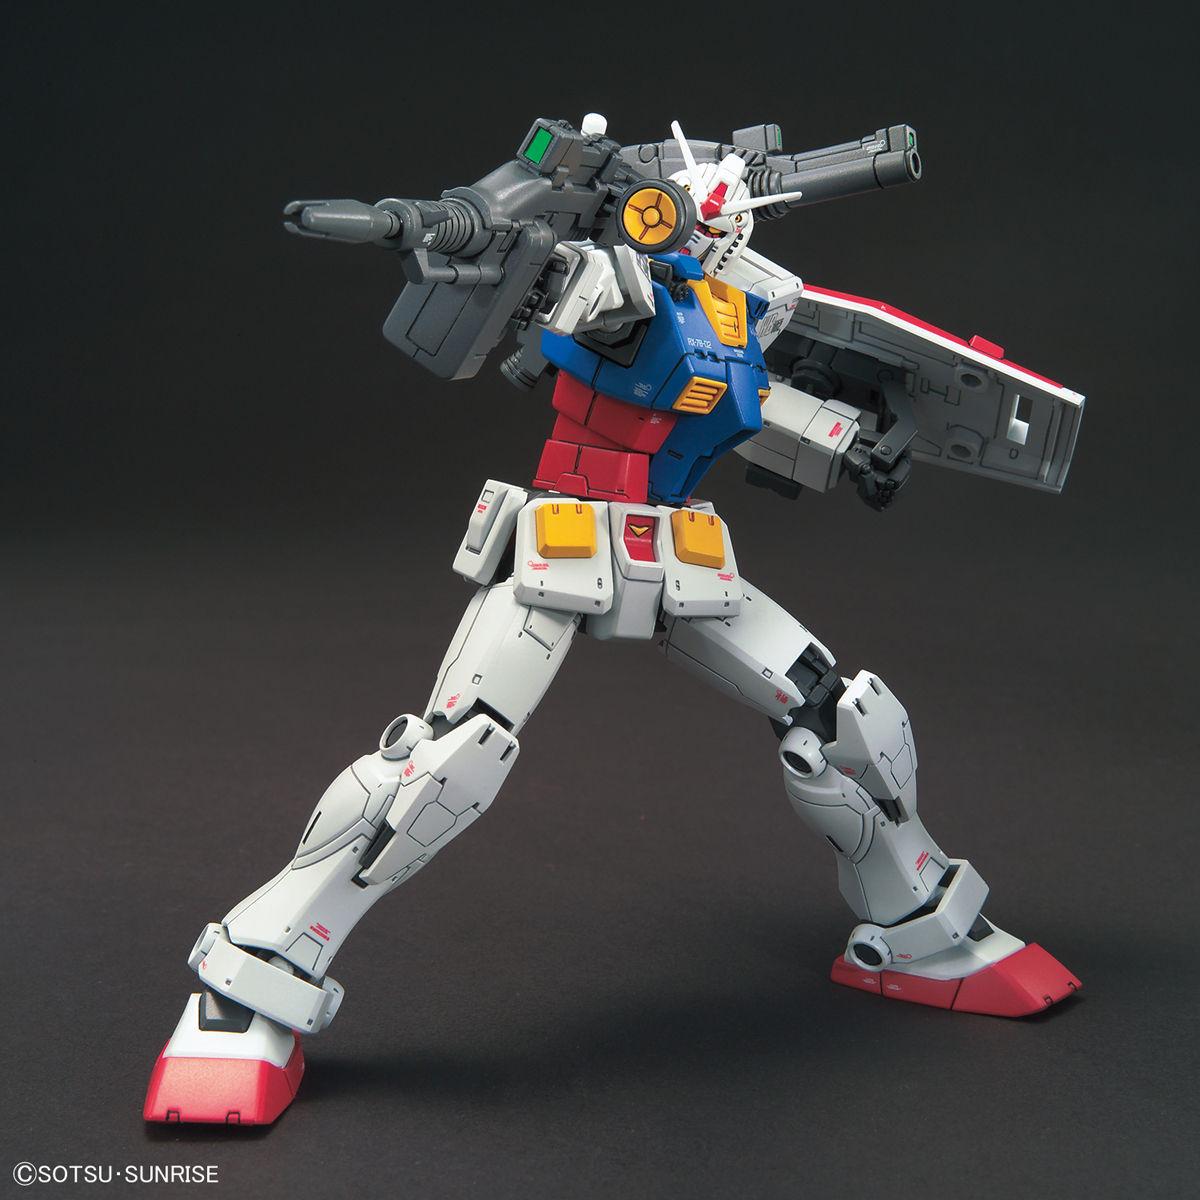 「HG 1/144 RX-78-02 ガンダム(GUNDAM THE ORIGIN版)」入荷